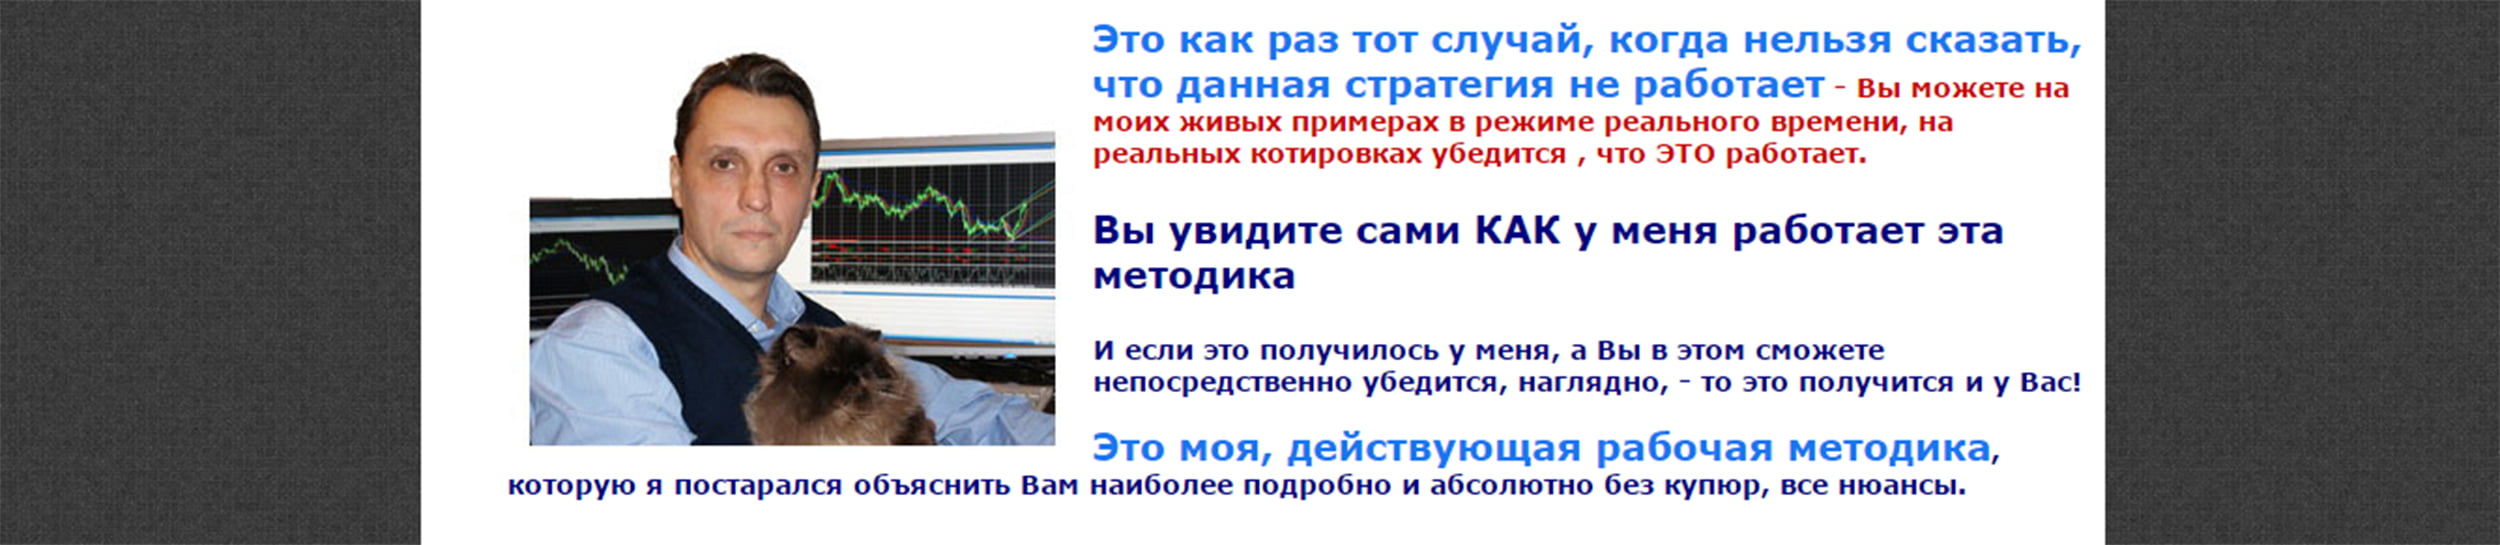 Кто такой Виталий Попов?